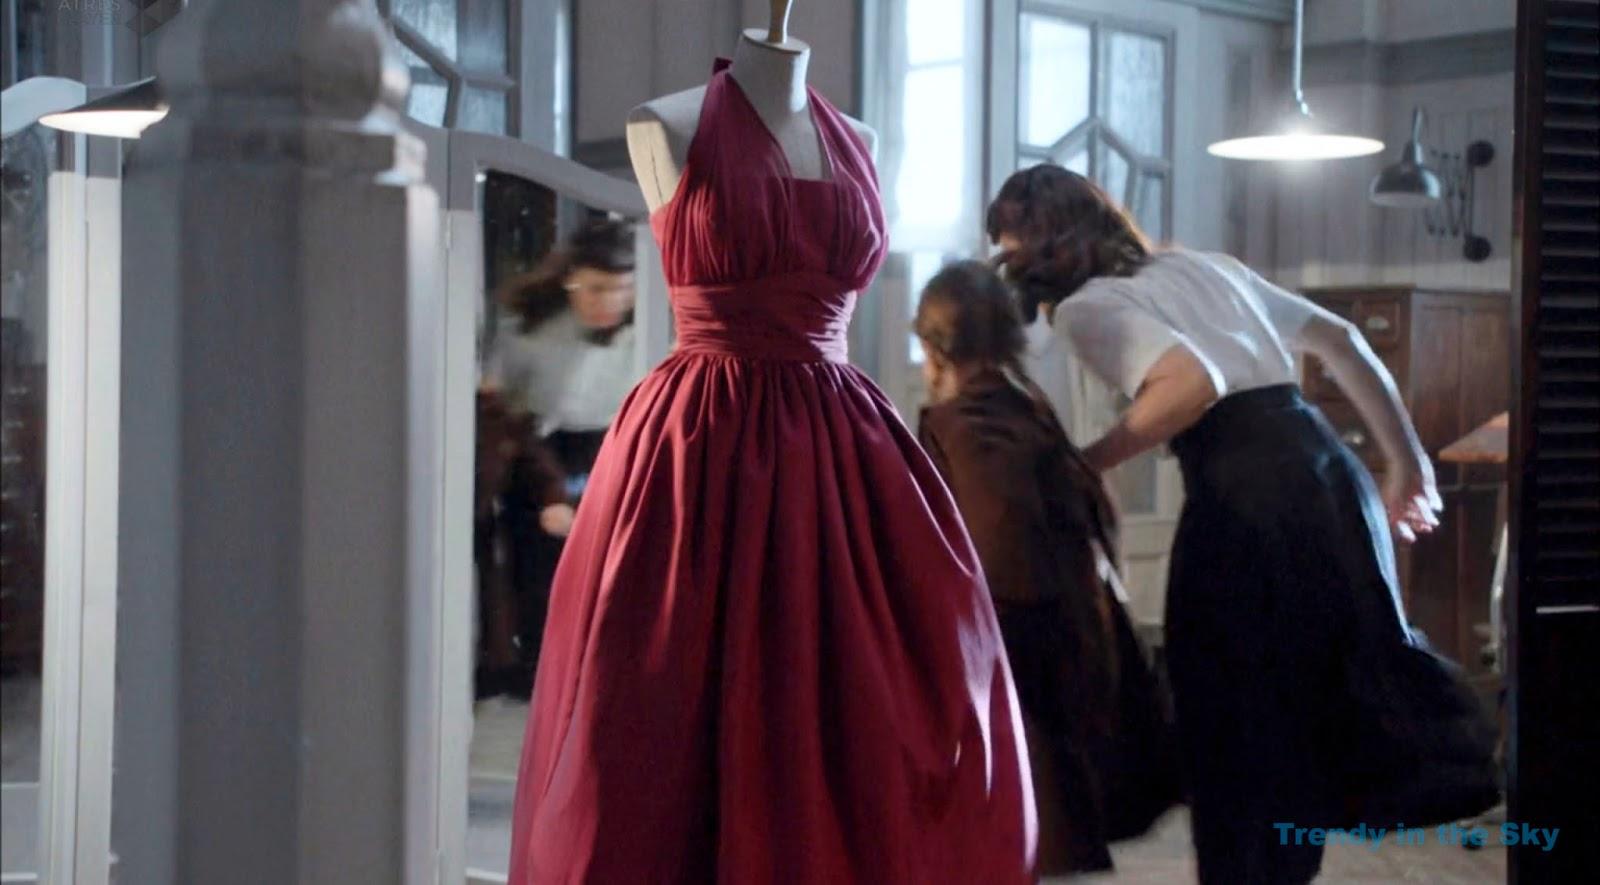 Galerías Velvet Ana vestido granate. Capítulo 1.